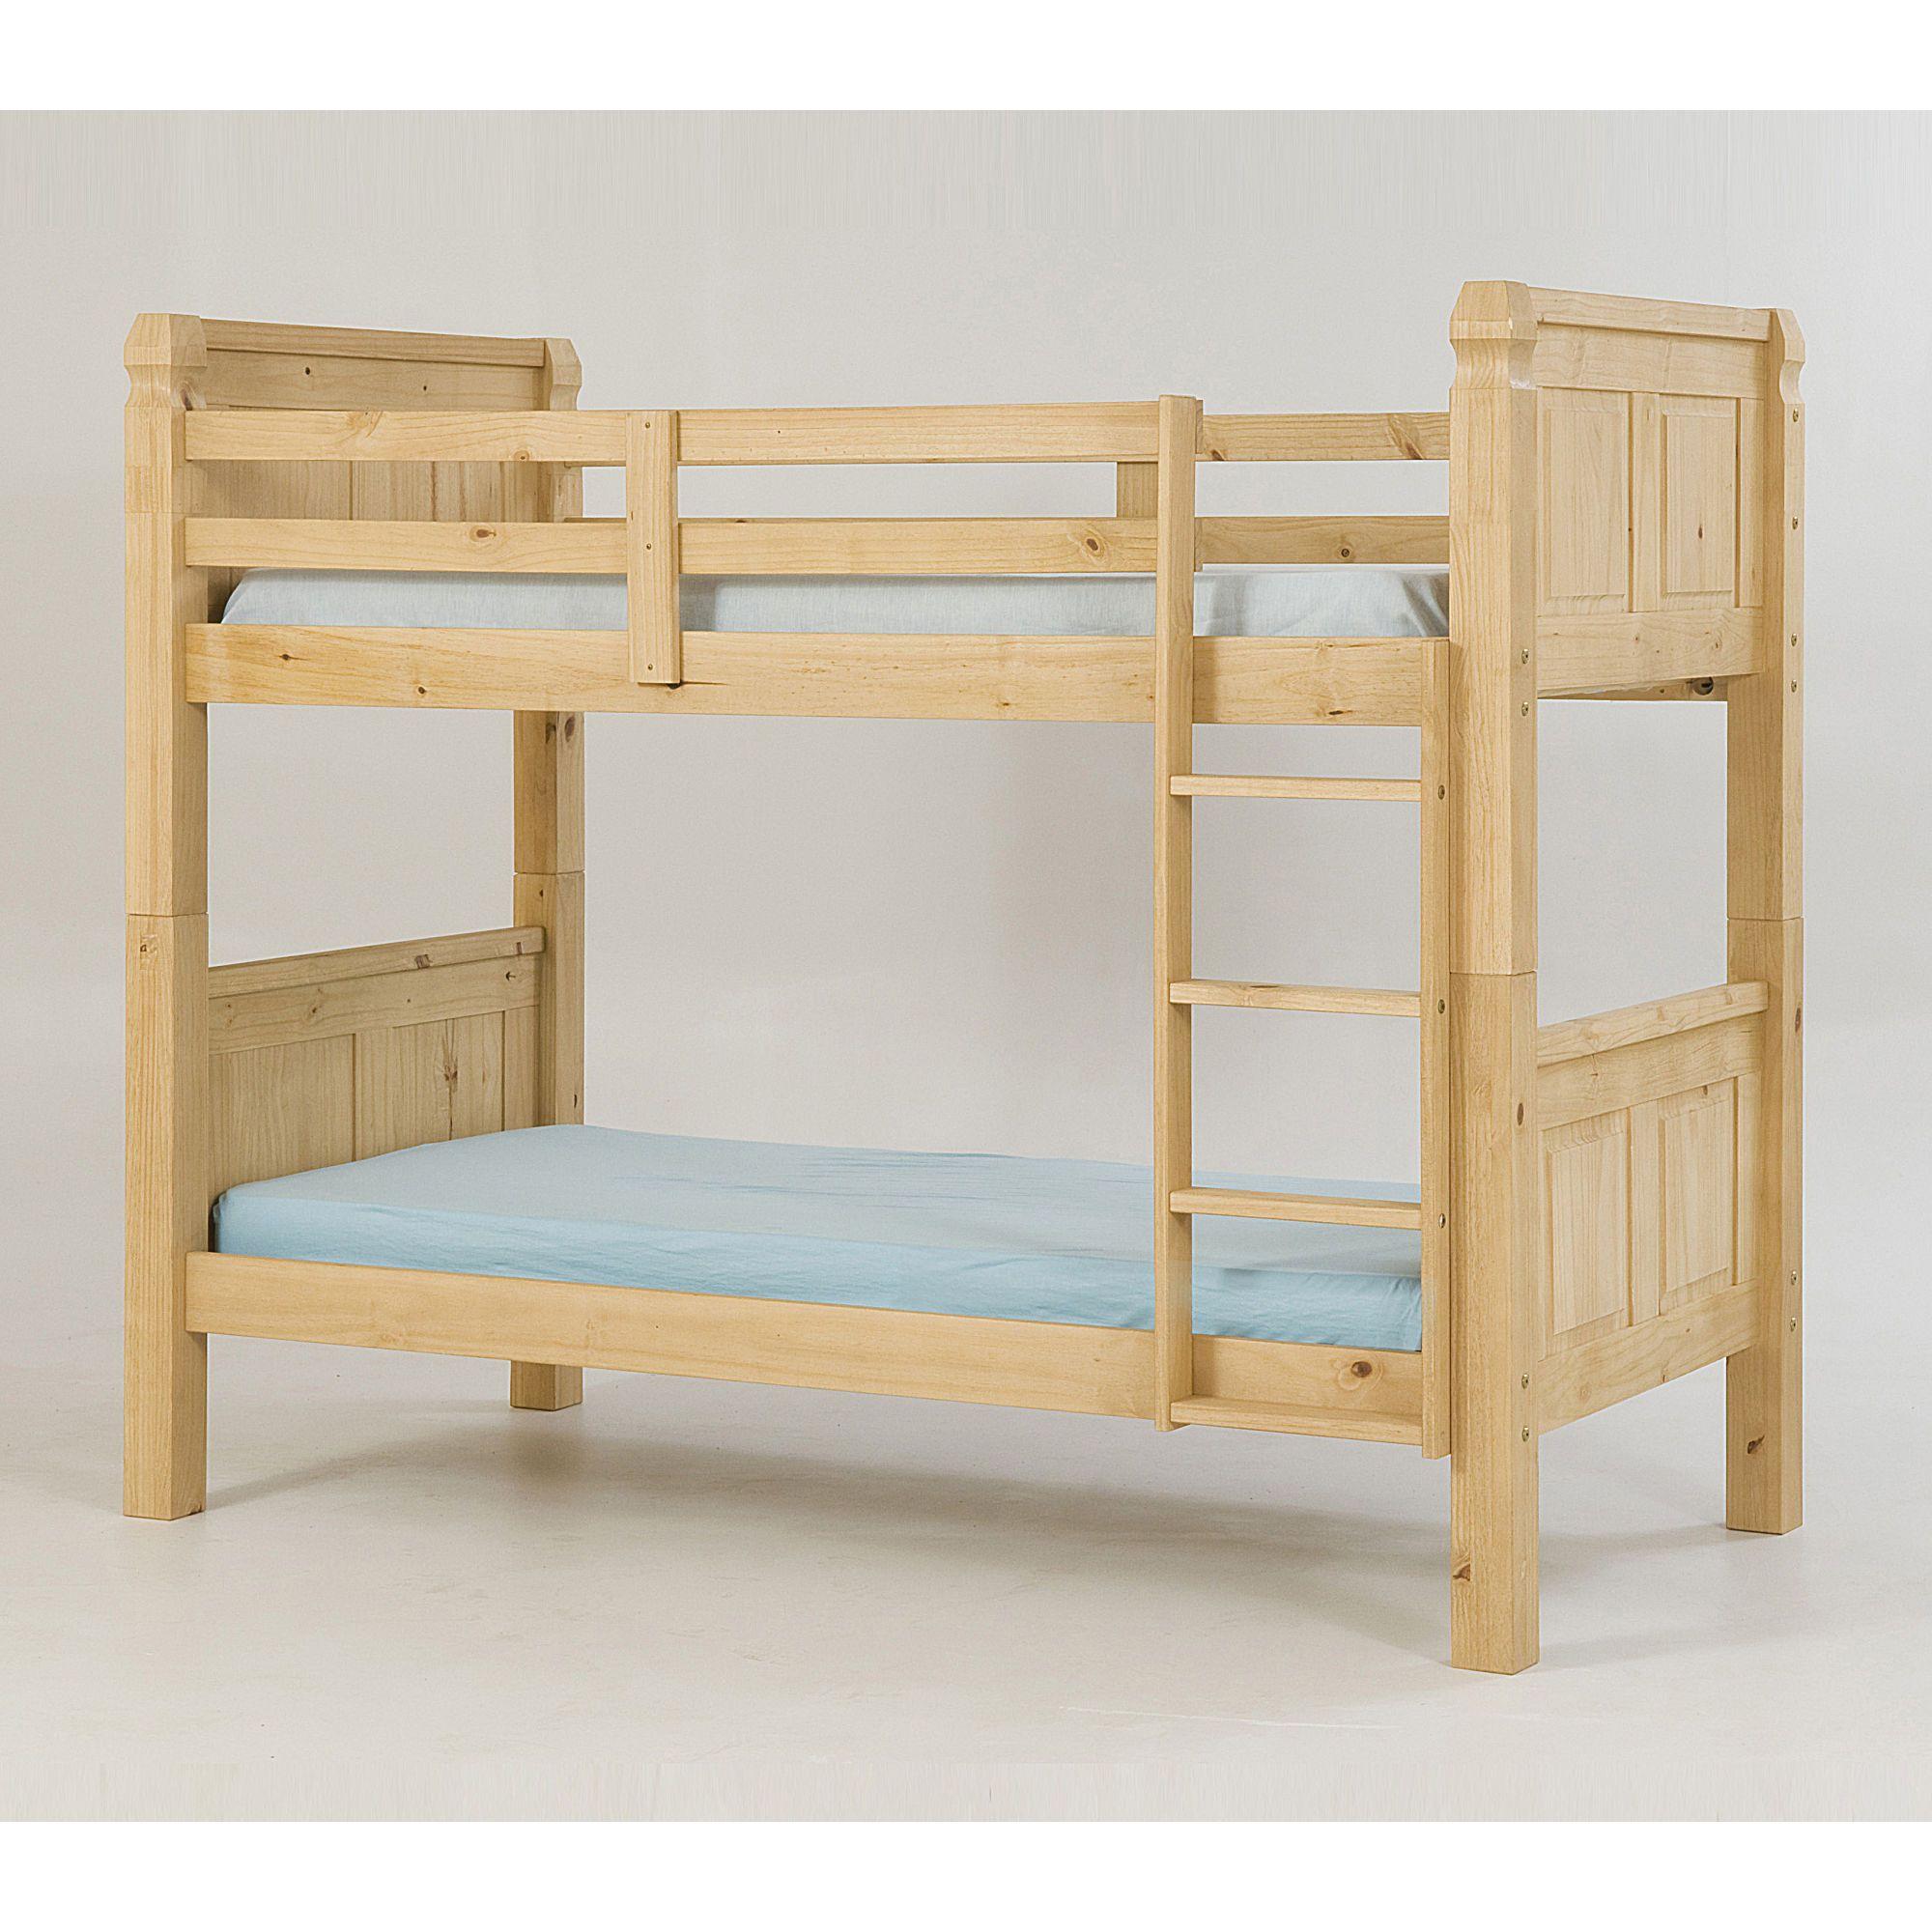 Heartlands Corona Single Bunk Bed Frame at Tescos Direct